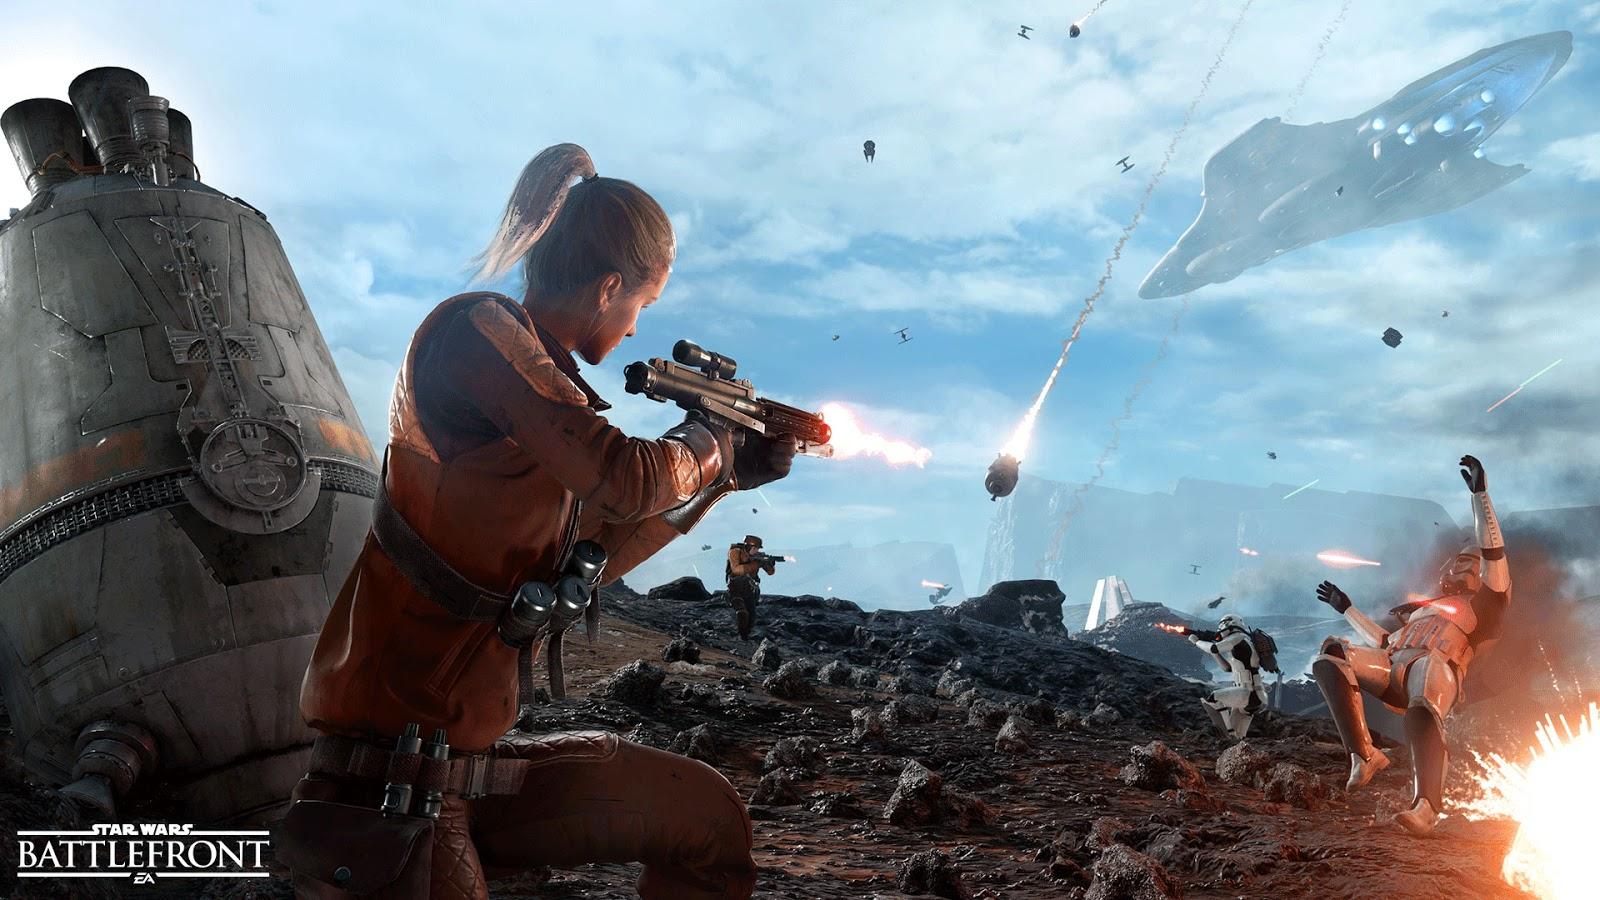 Star Wars Battlefront não vai impulsionar a franquia Battlefield